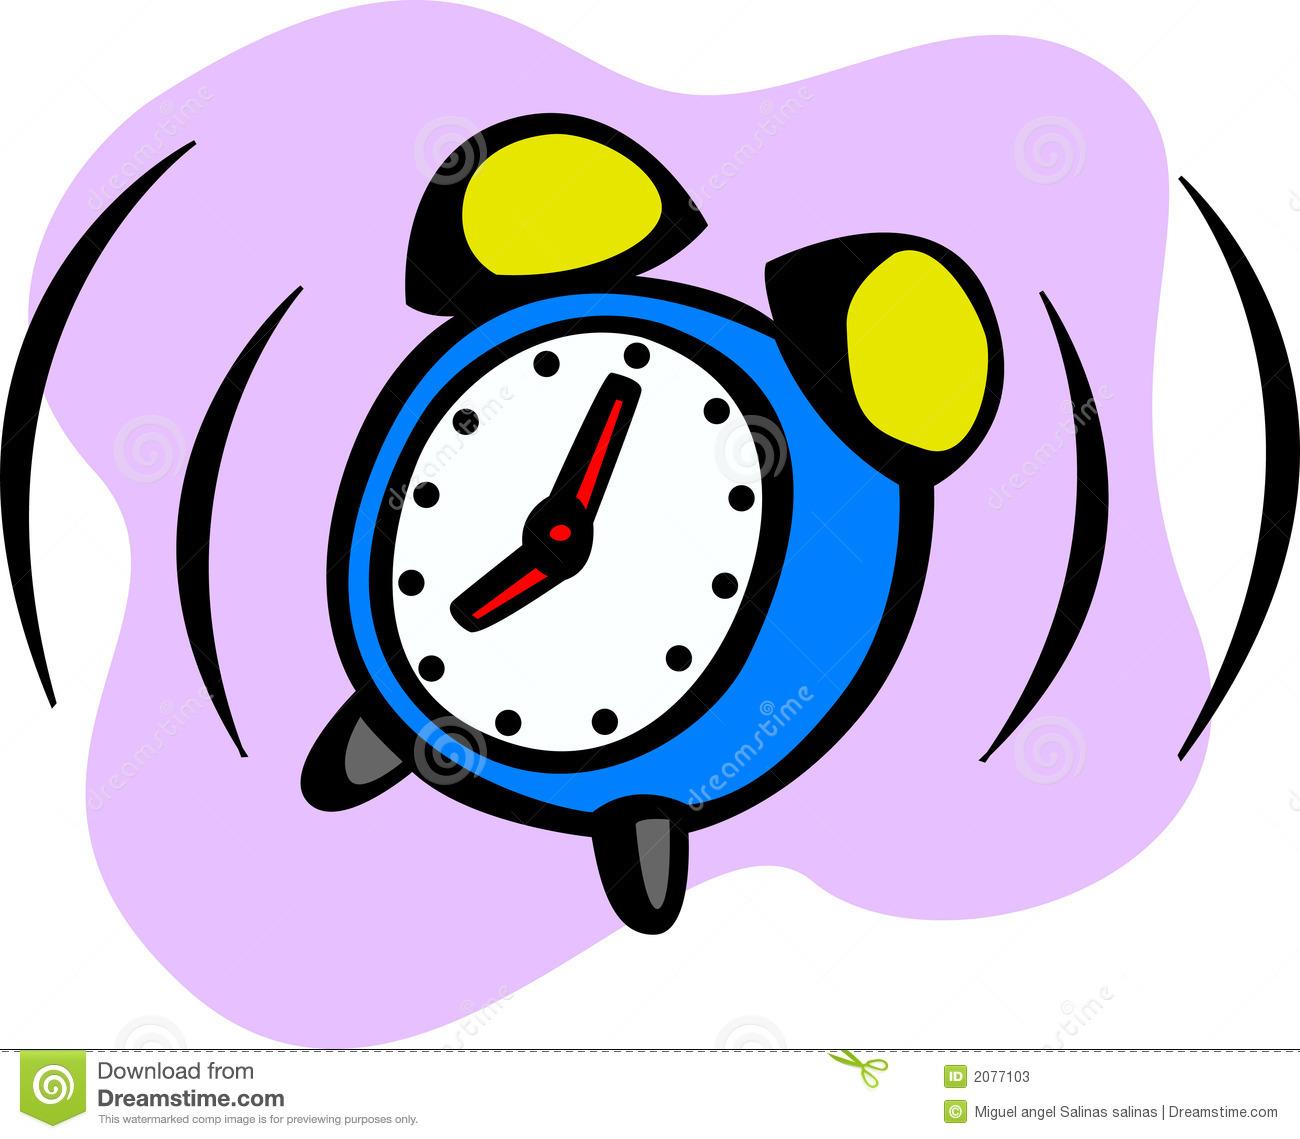 7 Unconventional Alarm Clocks  Mental Floss